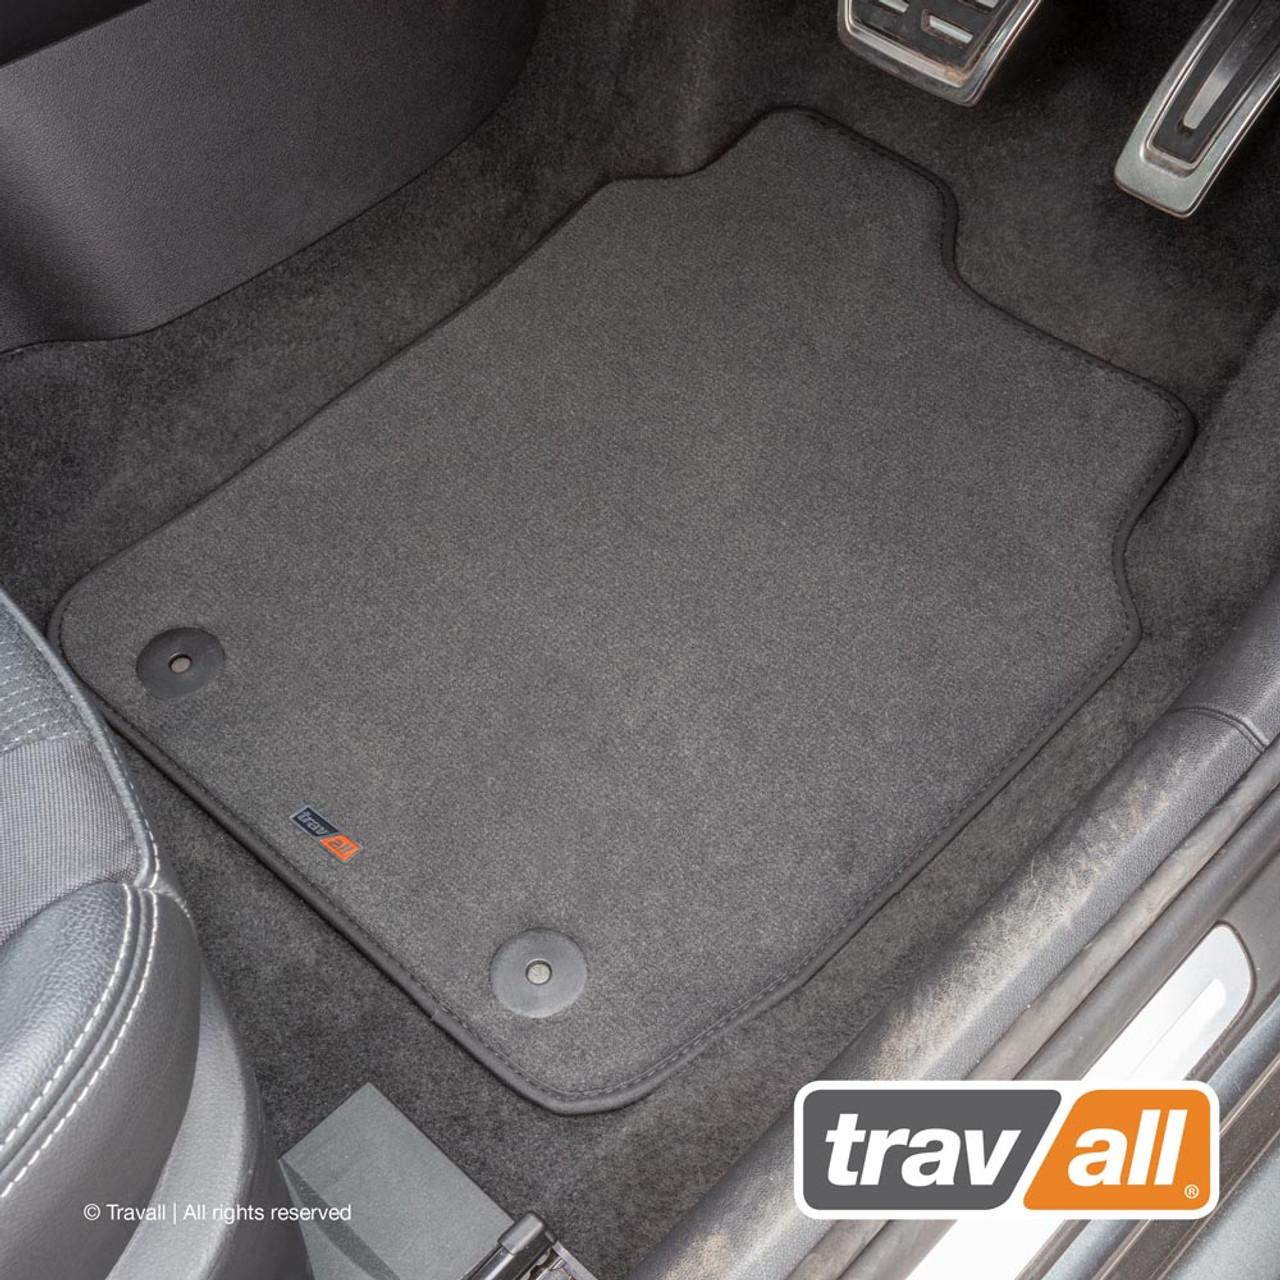 Custom Made Carpet Car Mats For Audi A1/S1 Hatchback 2010 to 2018